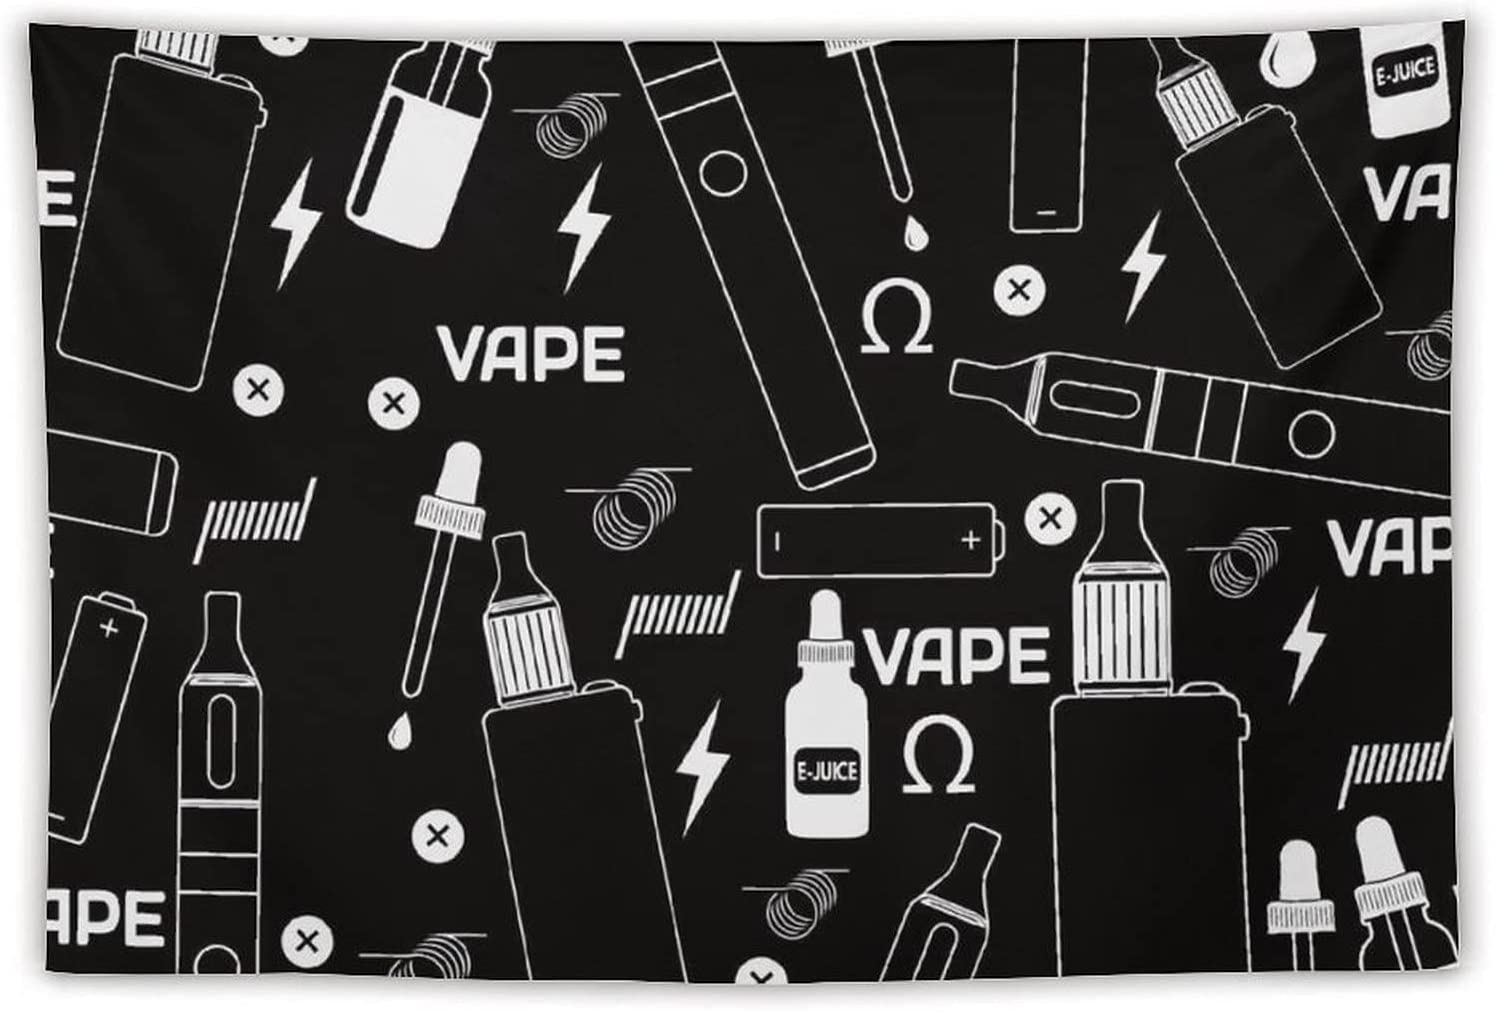 Manta Tapiz Para Colgar En Pared,Vape Shop o tienda de cigarrillos electrónicos sobre fondo negro, Estera Picnic Decoración Sala Estar,40x60